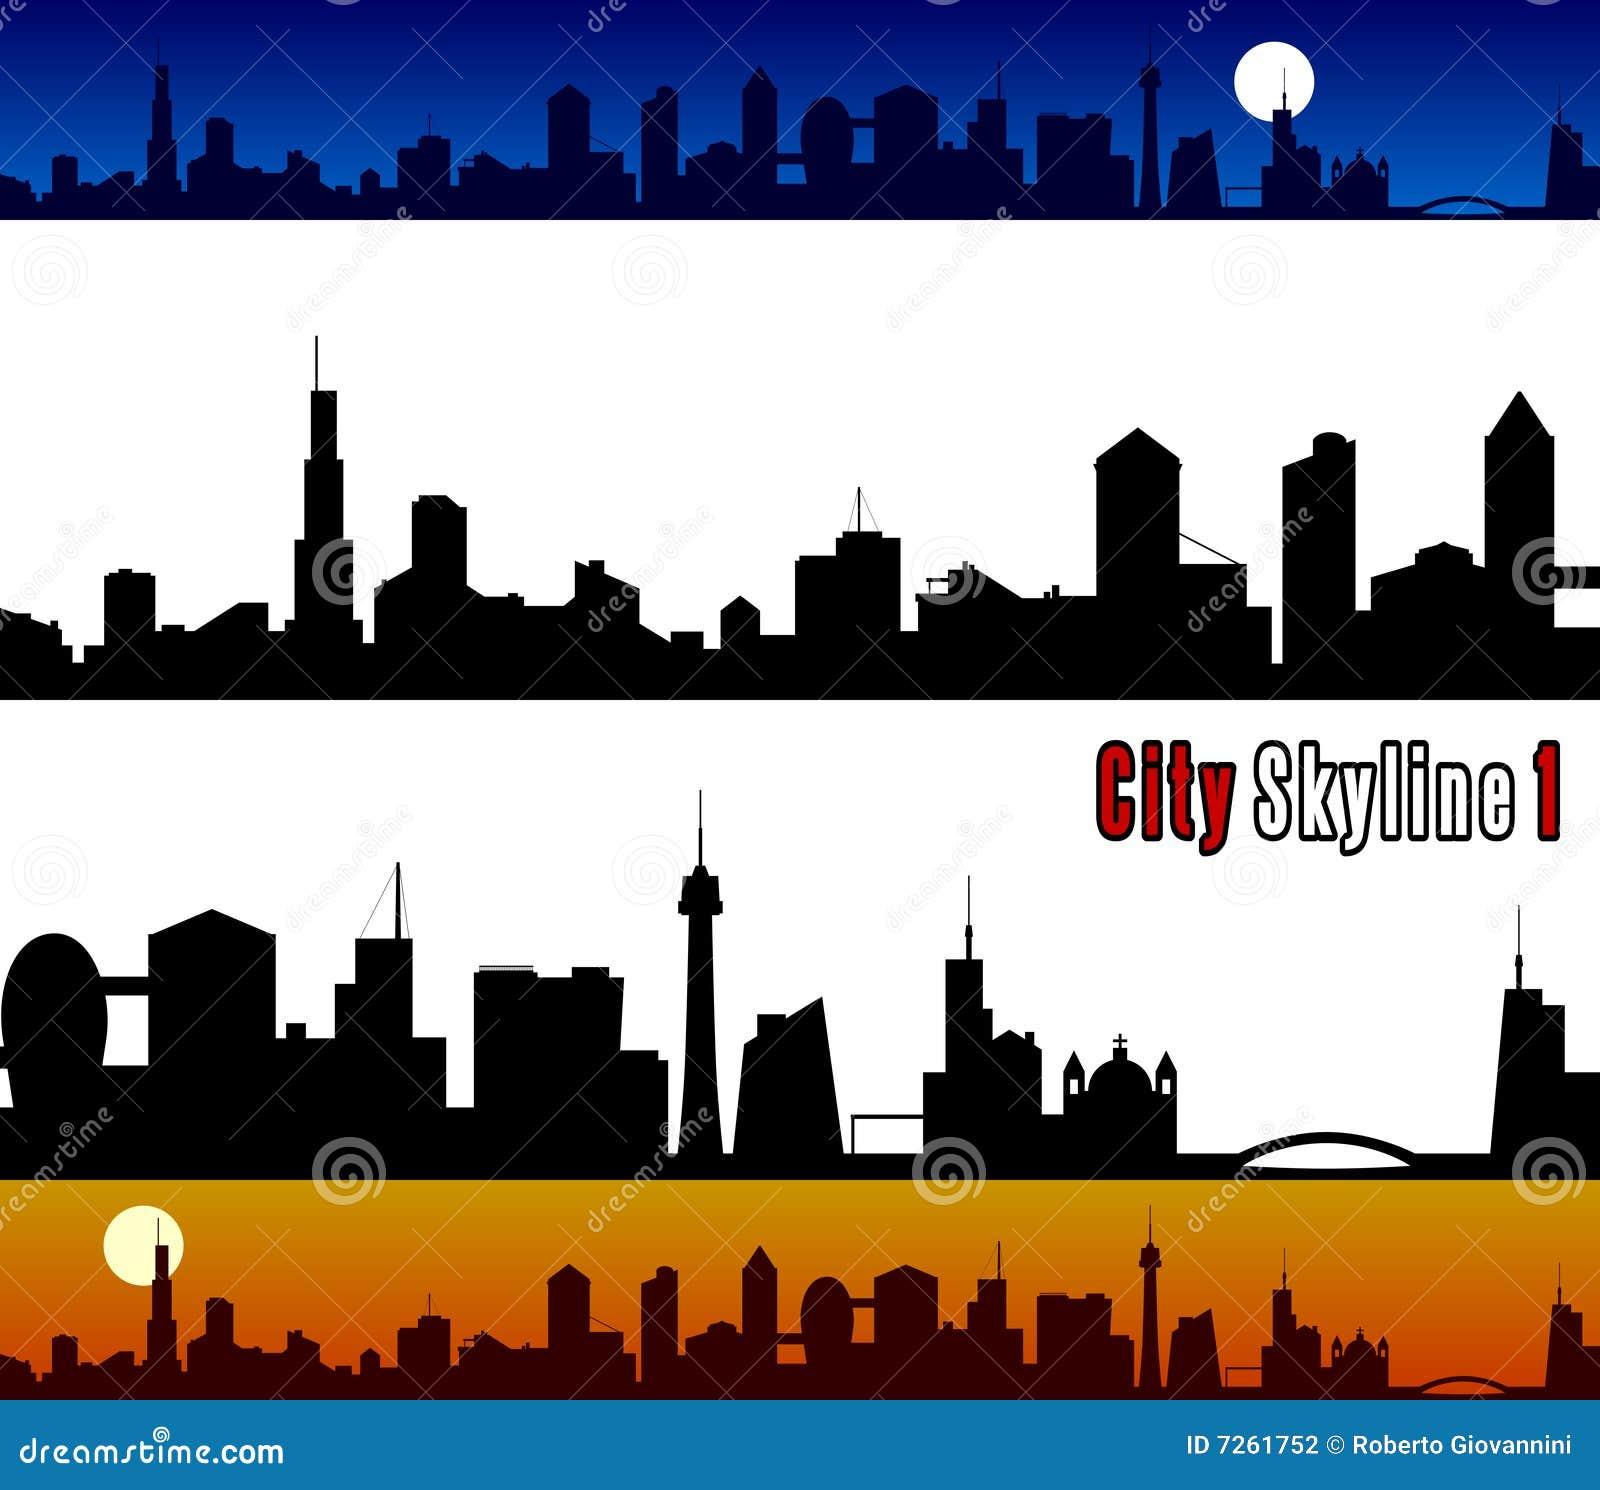 Stadt-Skyline [1]